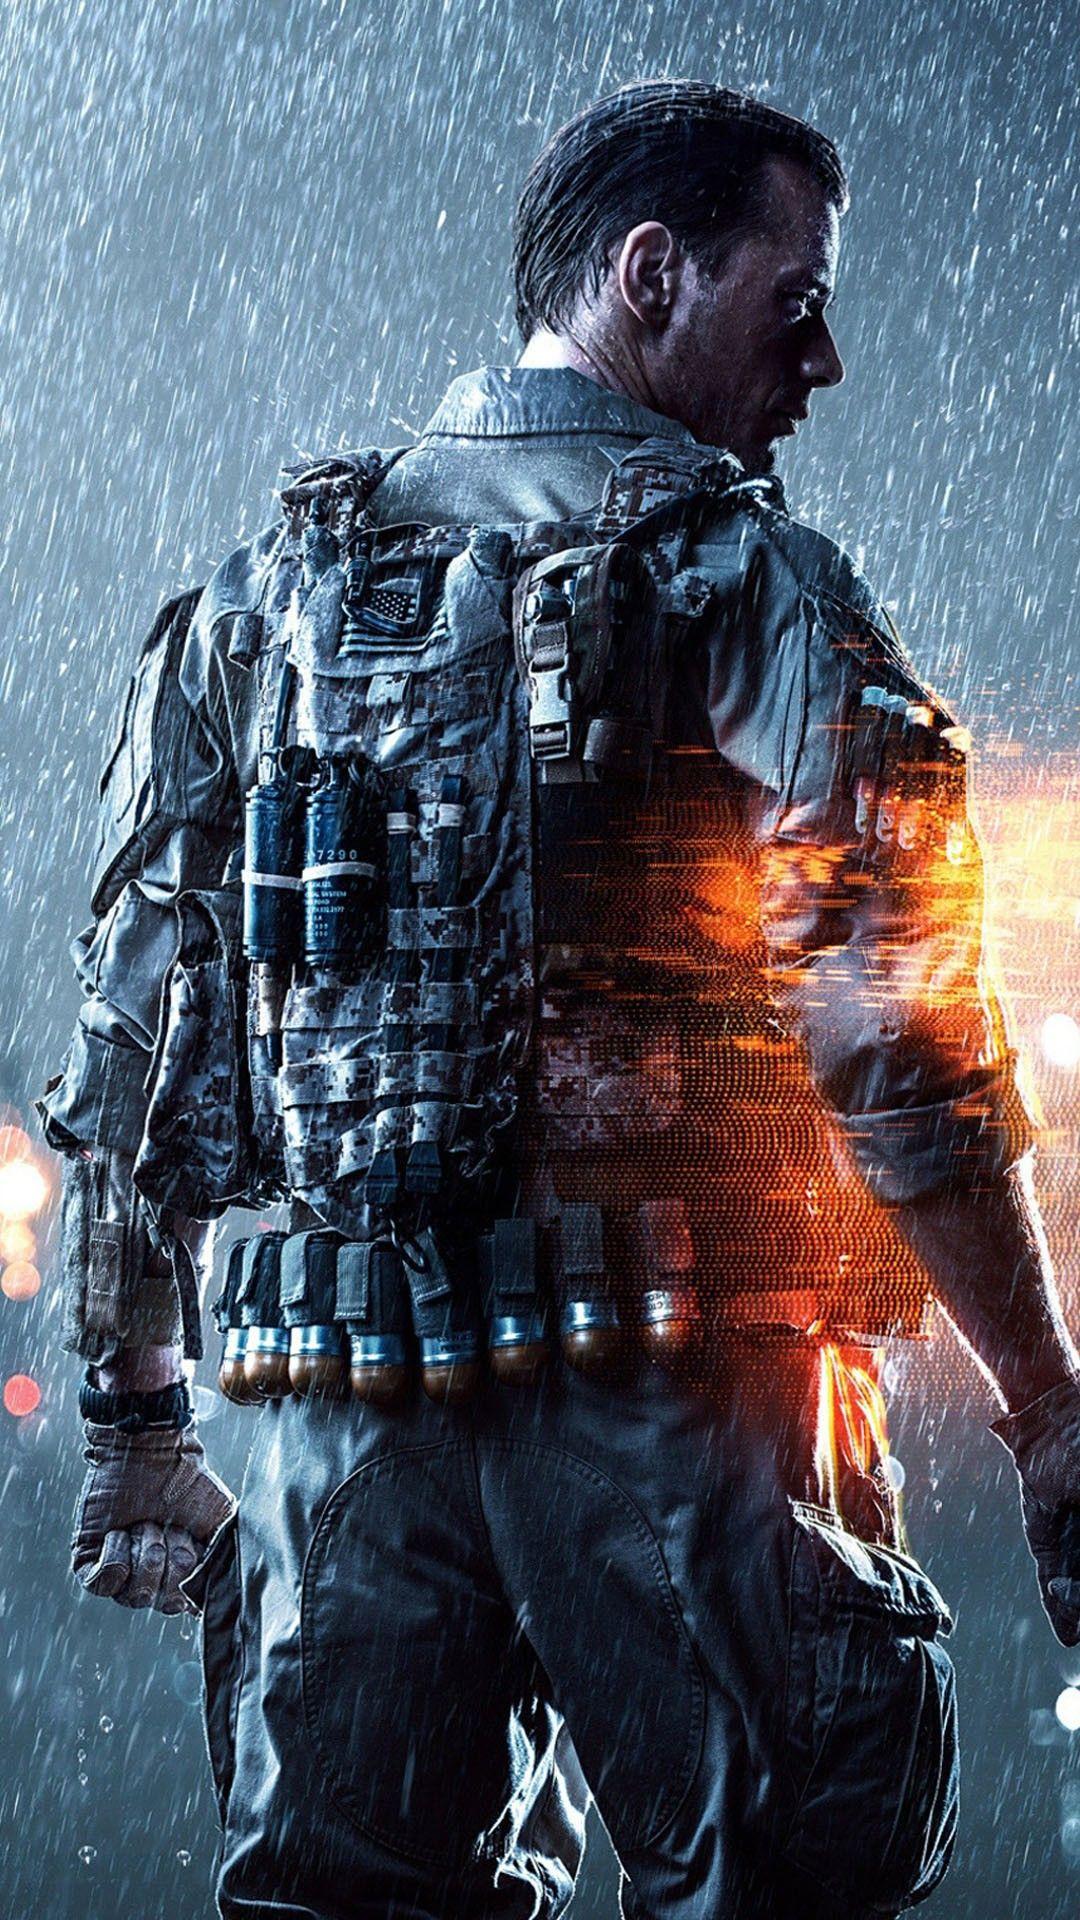 Battlefield 4 Game Samsung Smartphone Wallpaper And Lockscreen Hd Check More At Https Phonewallp Com Bat Lockscreen Hd Imagens Aleatorias Ideias Para Desenho